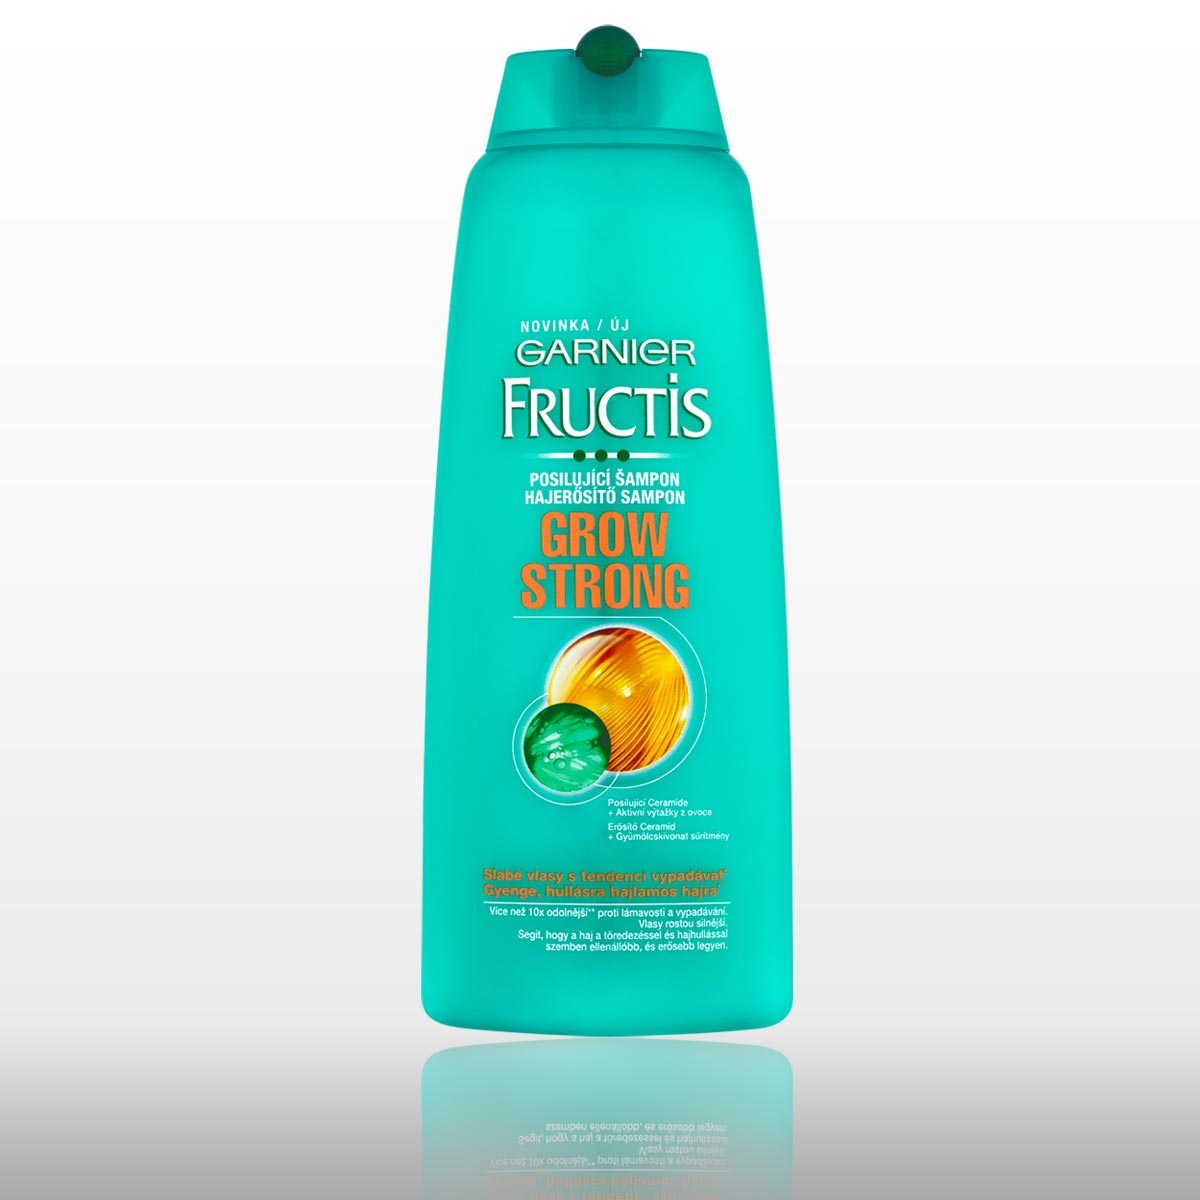 Šampon Garnier Fructis Grow Strong pro slabé vlasy.